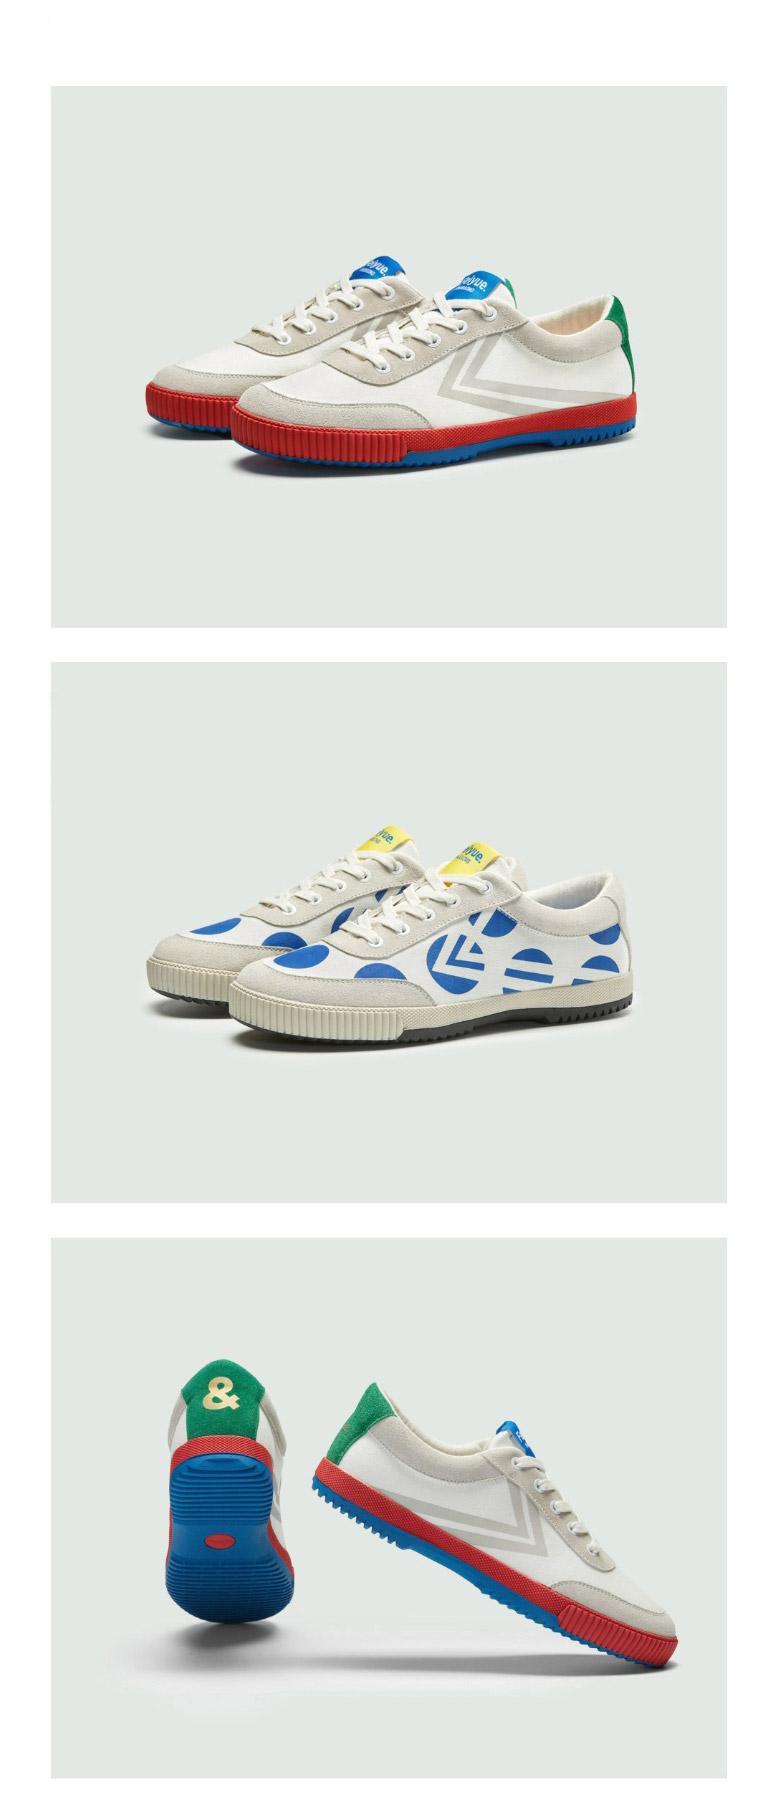 xiaomi feiyue men sneakers 2019